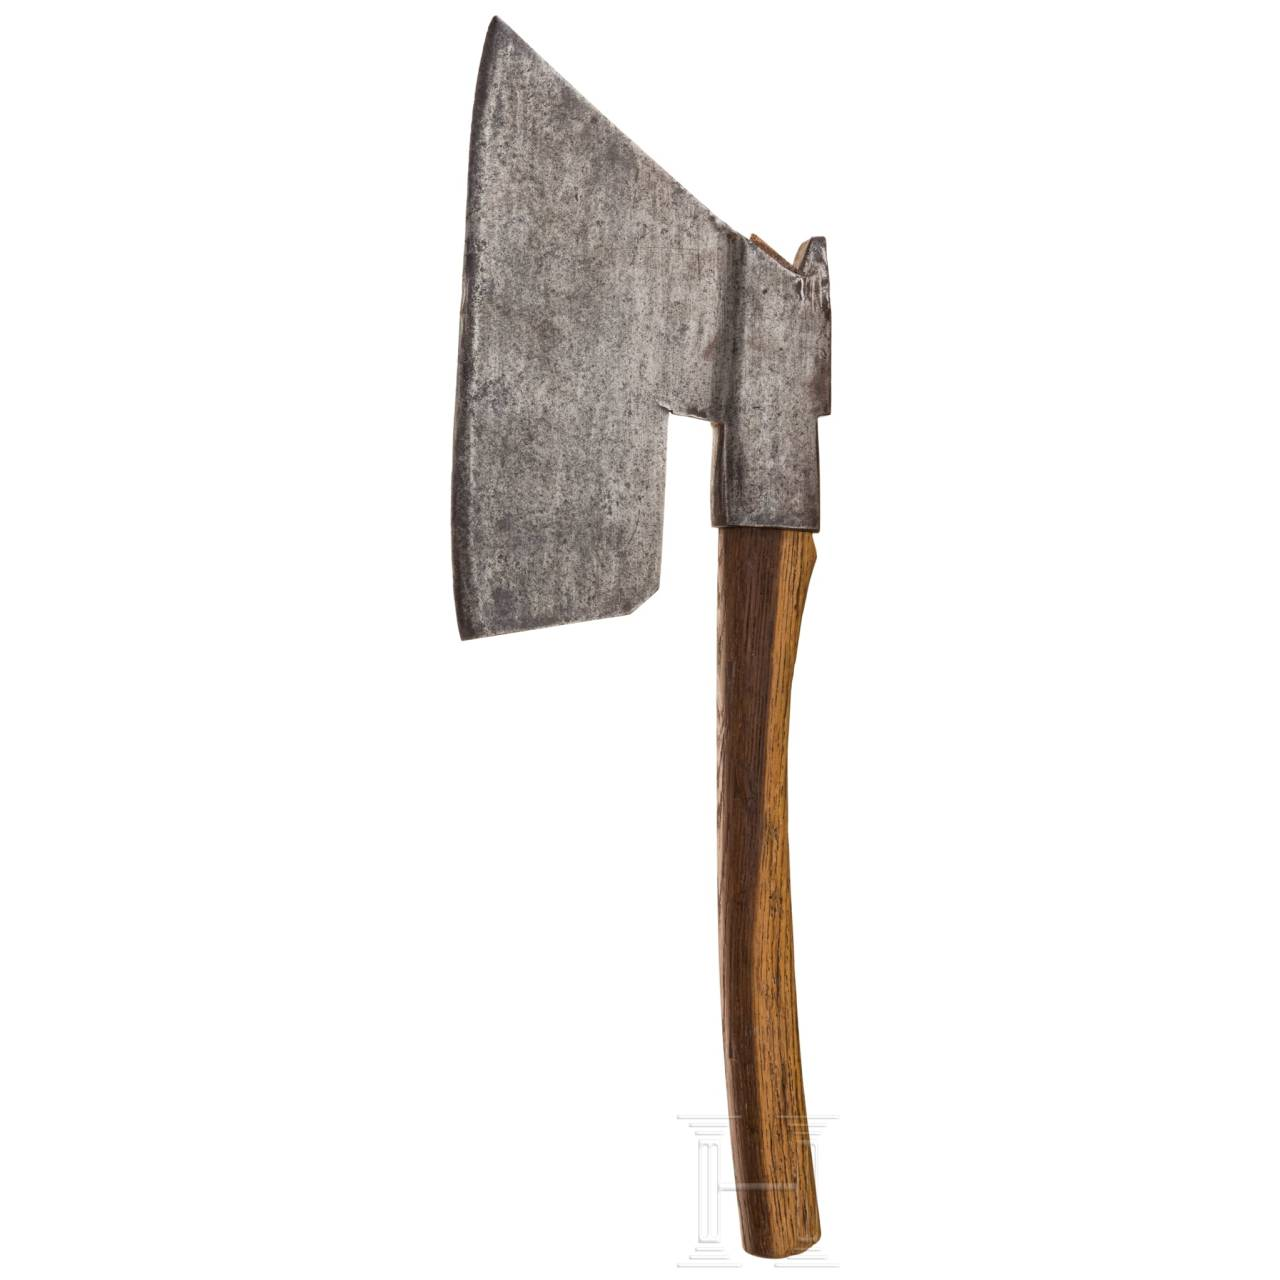 A German broad hatchet (carpenter's hatchet), 19th century